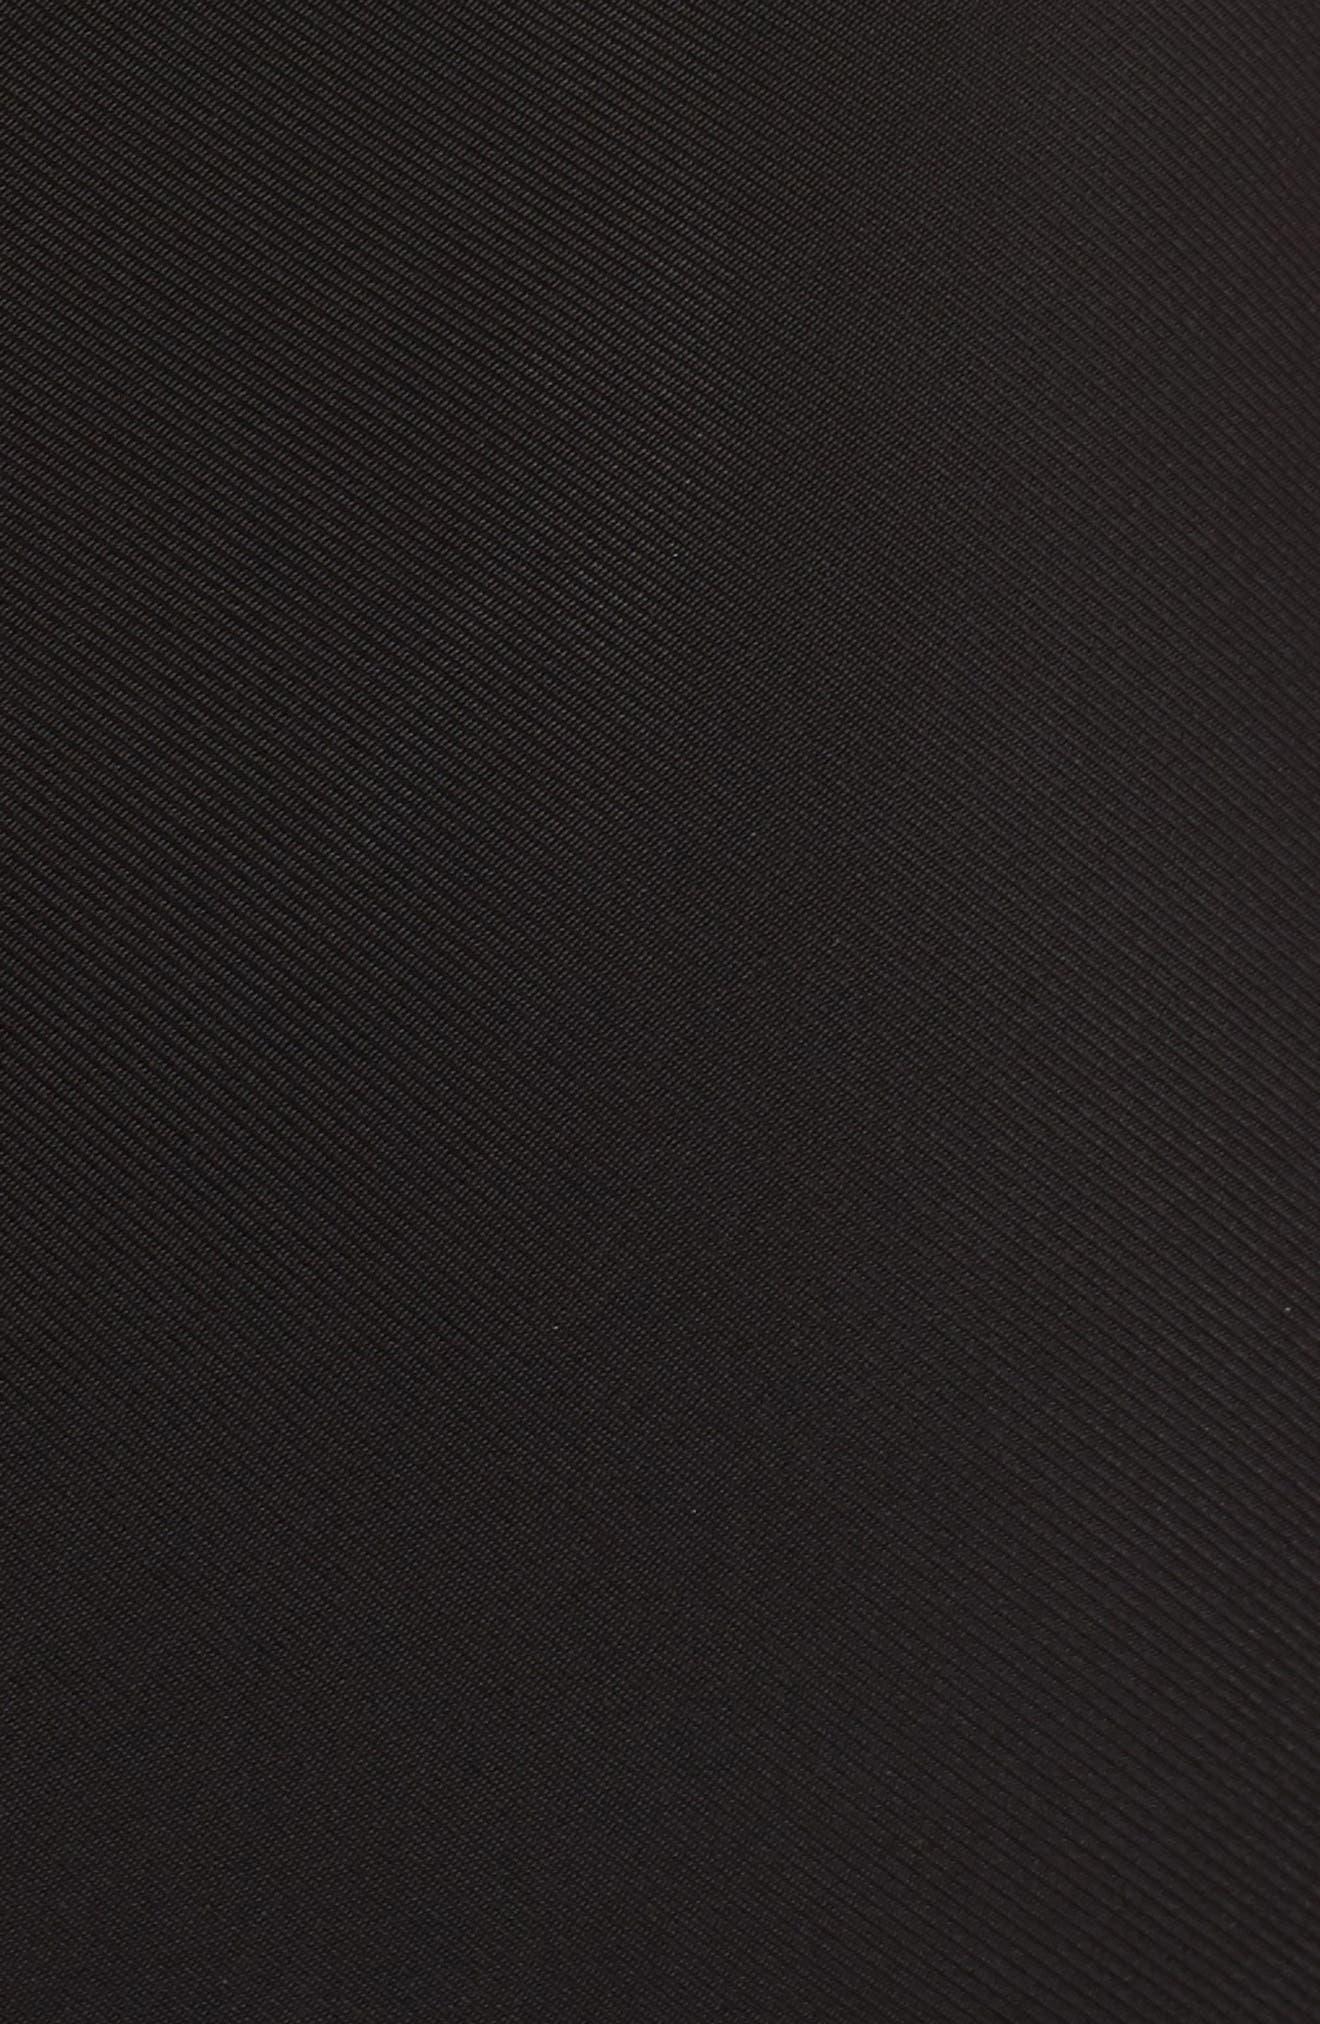 Tara High/Low Knit Dress,                             Alternate thumbnail 5, color,                             Black